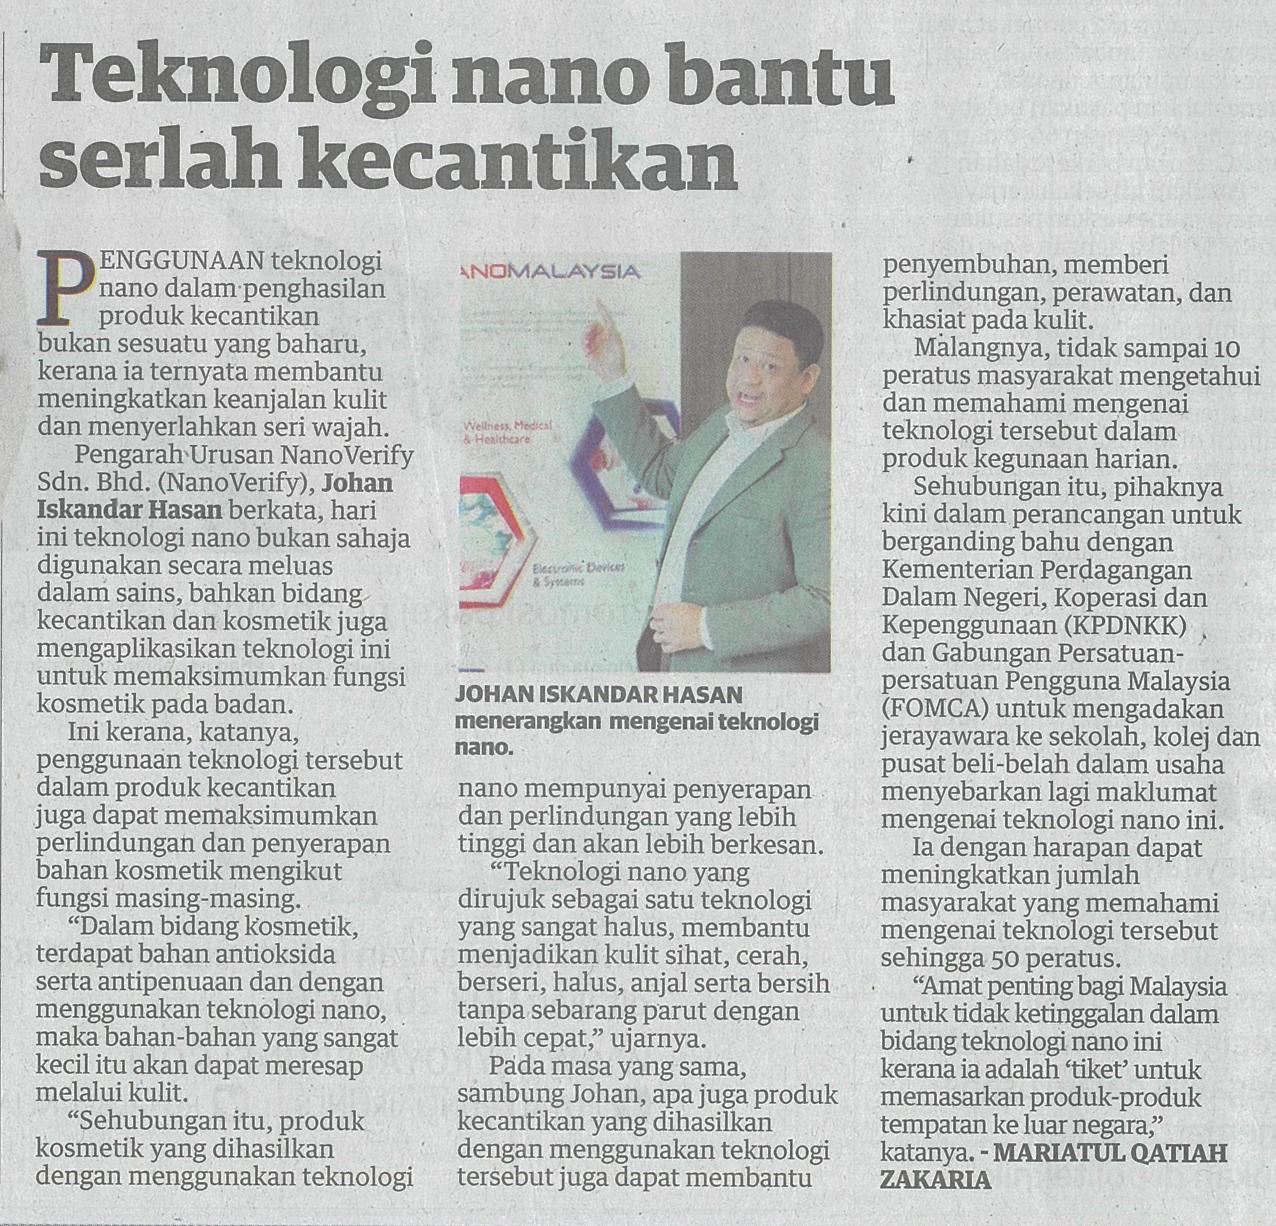 Utusan Malaysia: Teknologi Nano Bantu Serlah Kecantikan